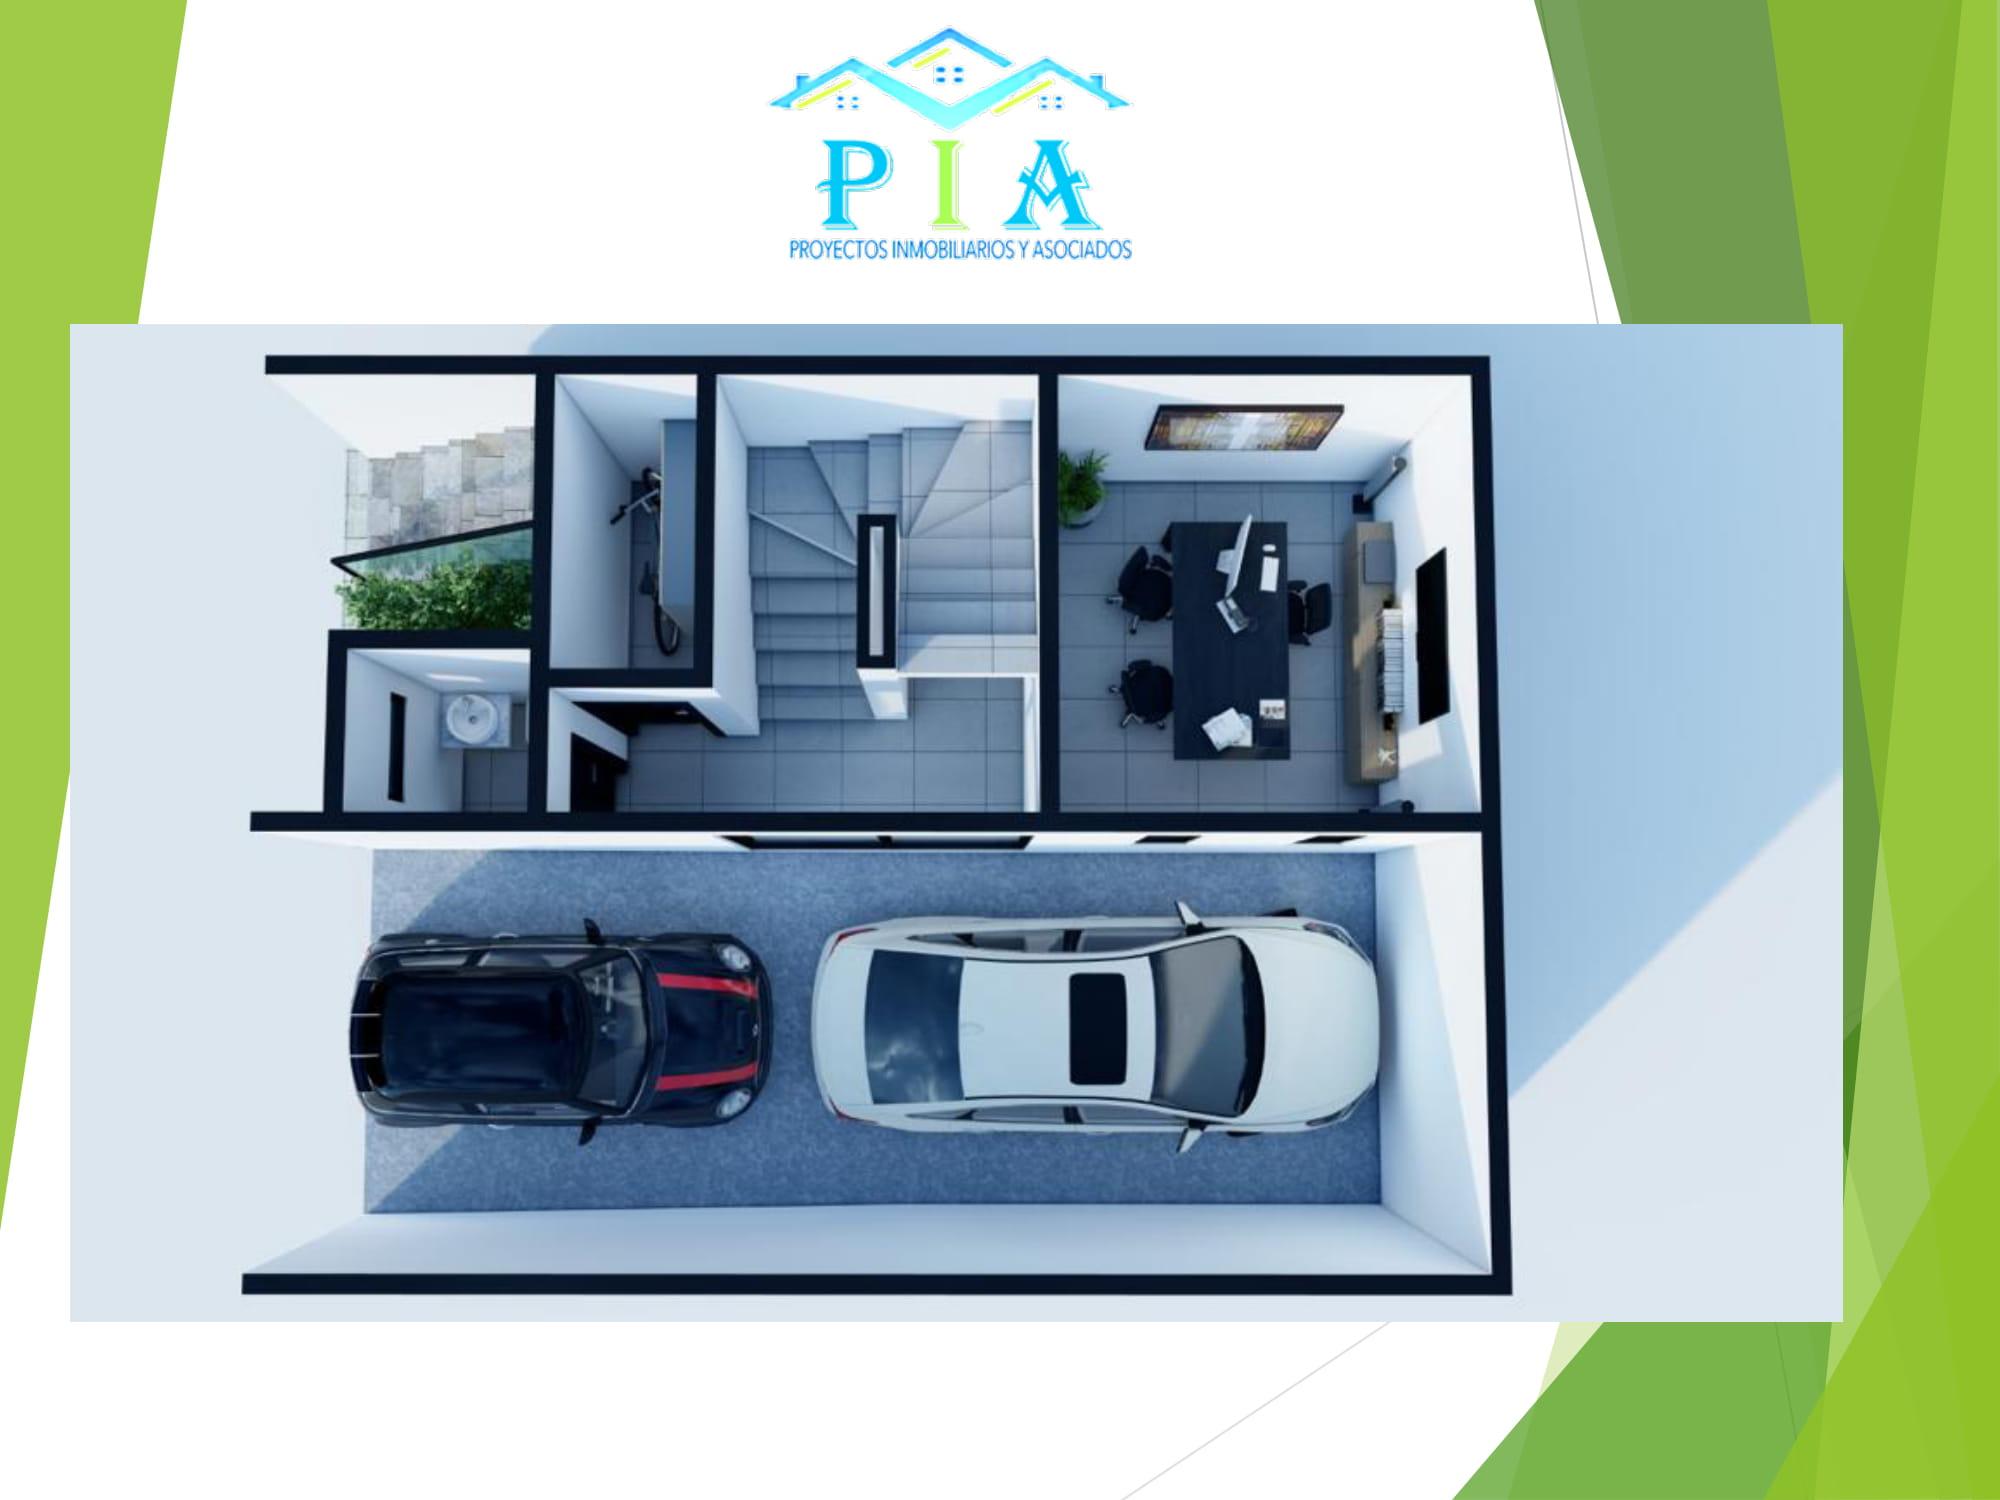 https://0201.nccdn.net/1_2/000/000/0ea/bb1/venta-residencial-teya-2.jpg